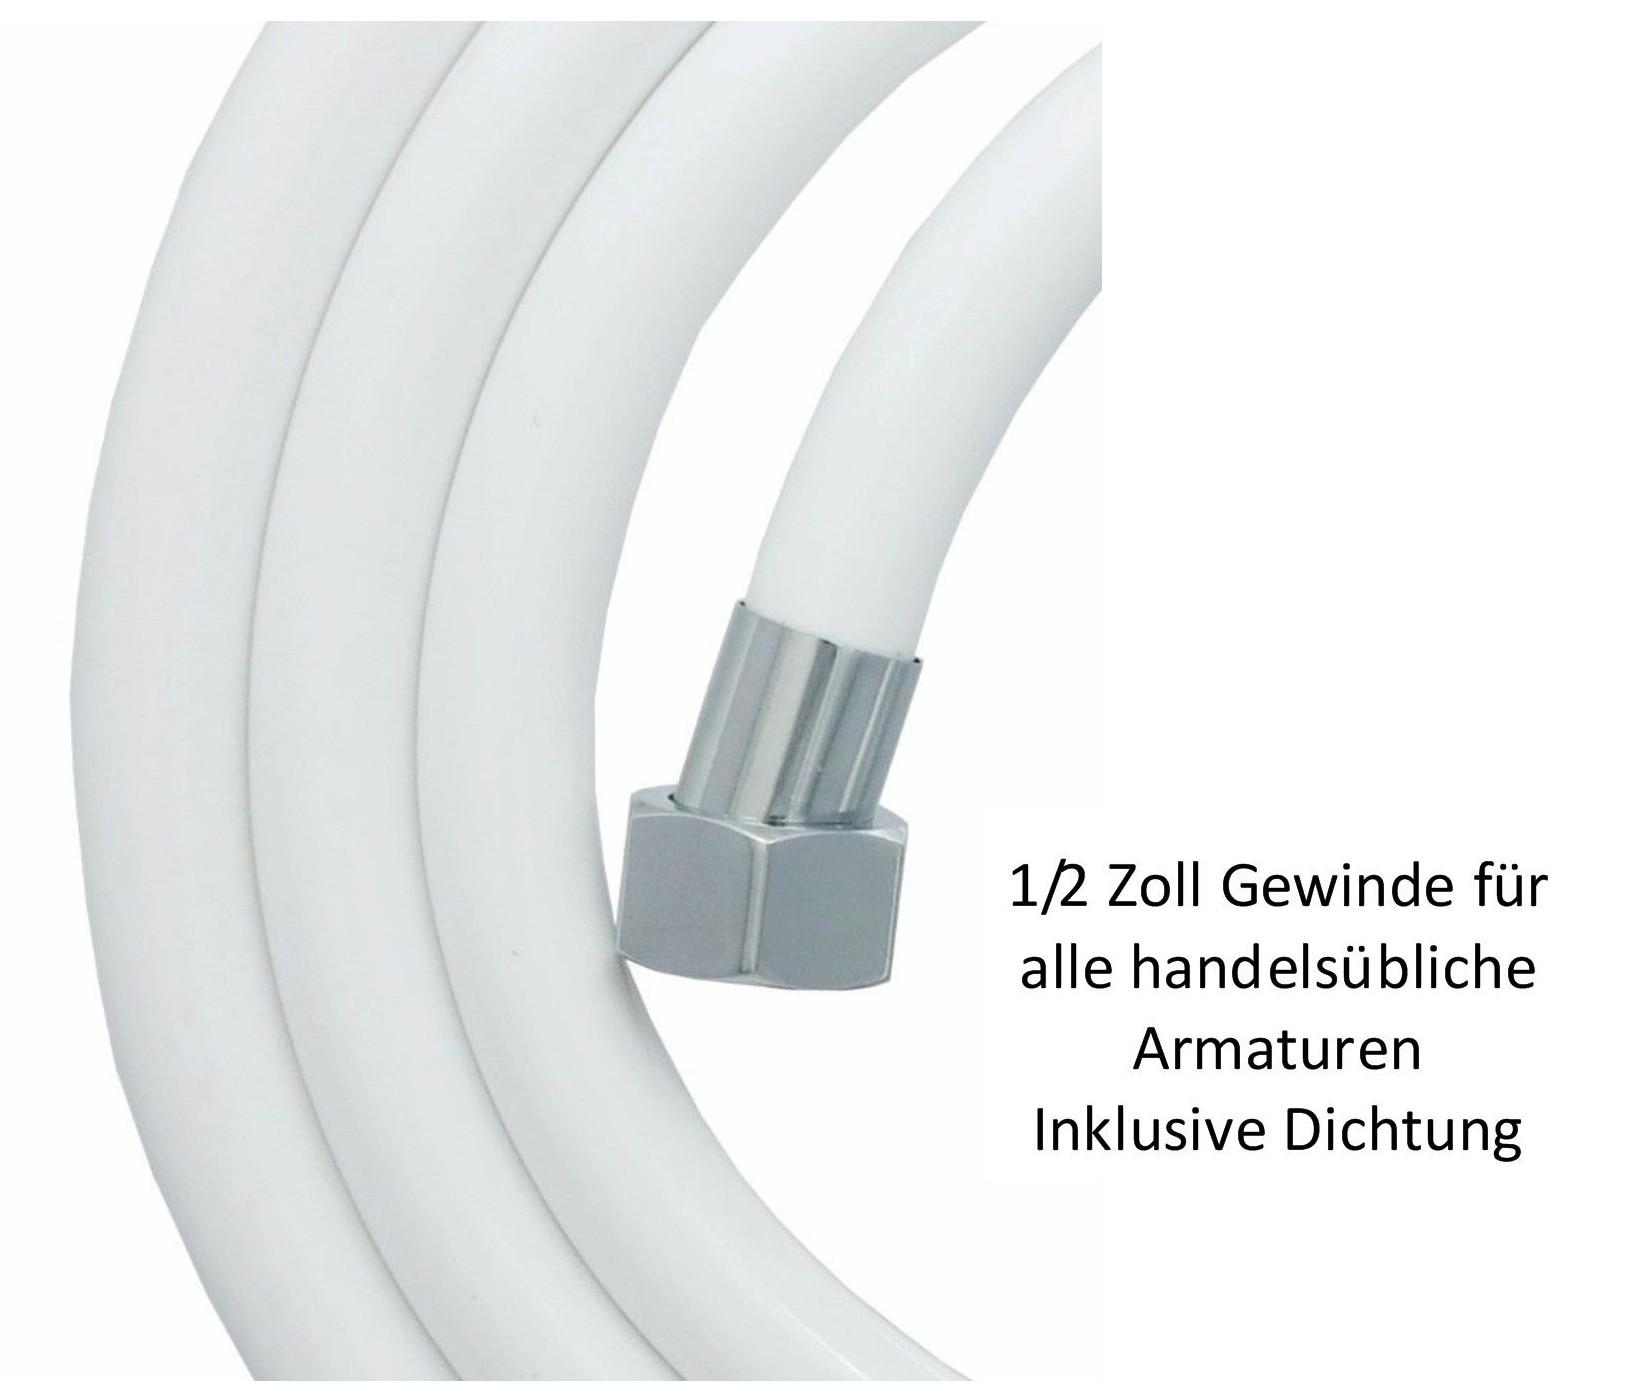 brauseschlauch 200cm duschschlauch pvc verdrehschutz 1 2 zoll schlauch in weiss ebay. Black Bedroom Furniture Sets. Home Design Ideas